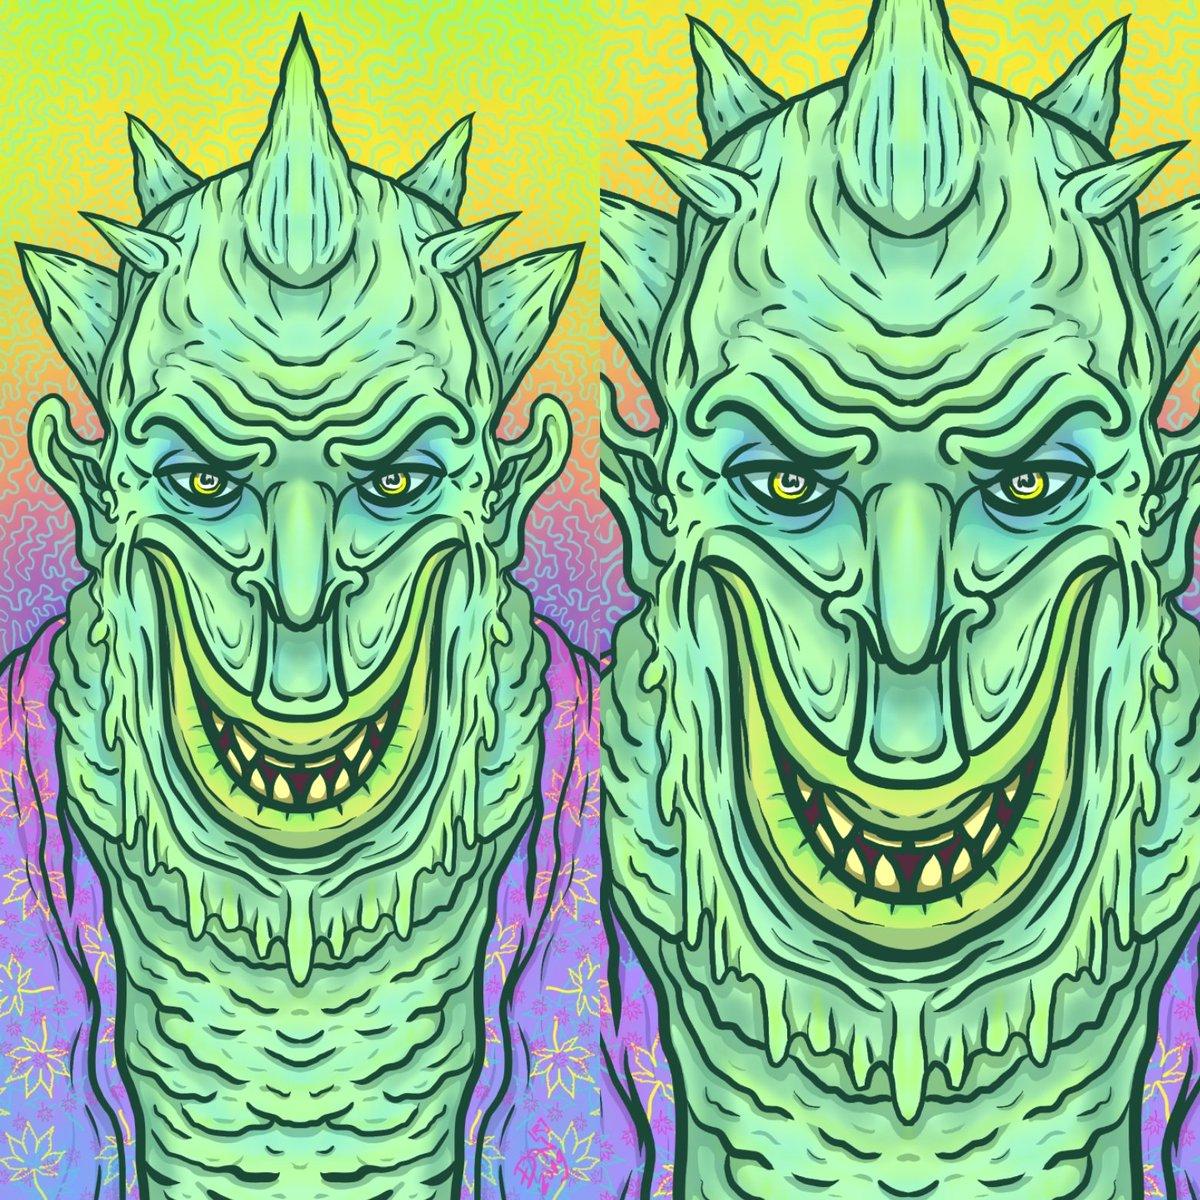 Nikolass Stojanović on Twitter: #art #artist #ilustrator #ilustration #digitalartist #digitalart #designer #demon #green #weed #horror #tattoo #sketchbook #slime #nikolass #nikolass83 #nikolass83gianni #deviantart #penup #note8art #note8 #spen #ibispaintx #samsungglobal #samsungsrbija #srbija #serbia…